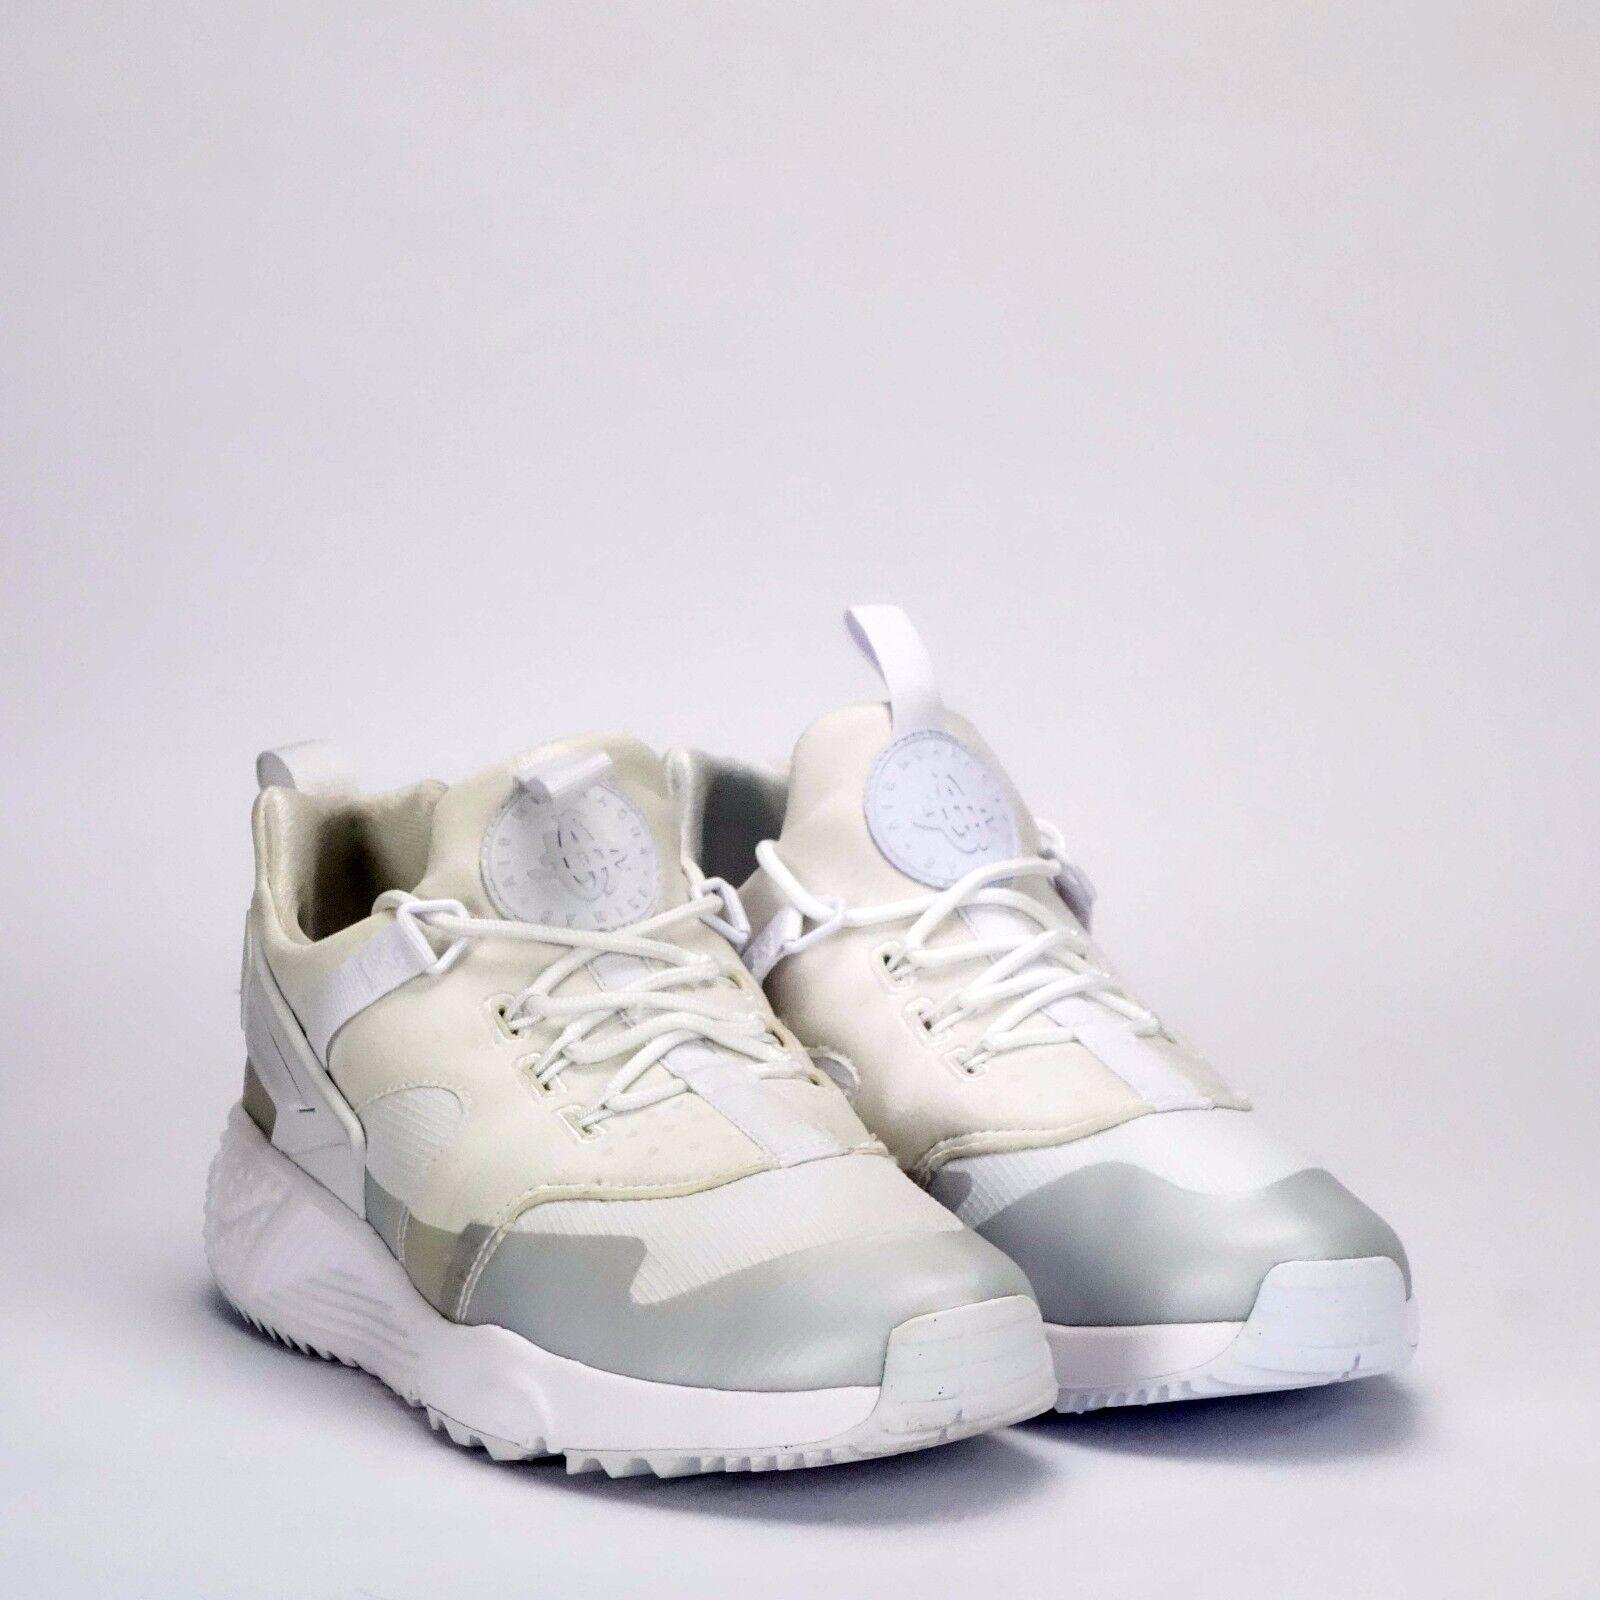 Nike Air Huarache Utility Men's Shoes White Ex Display